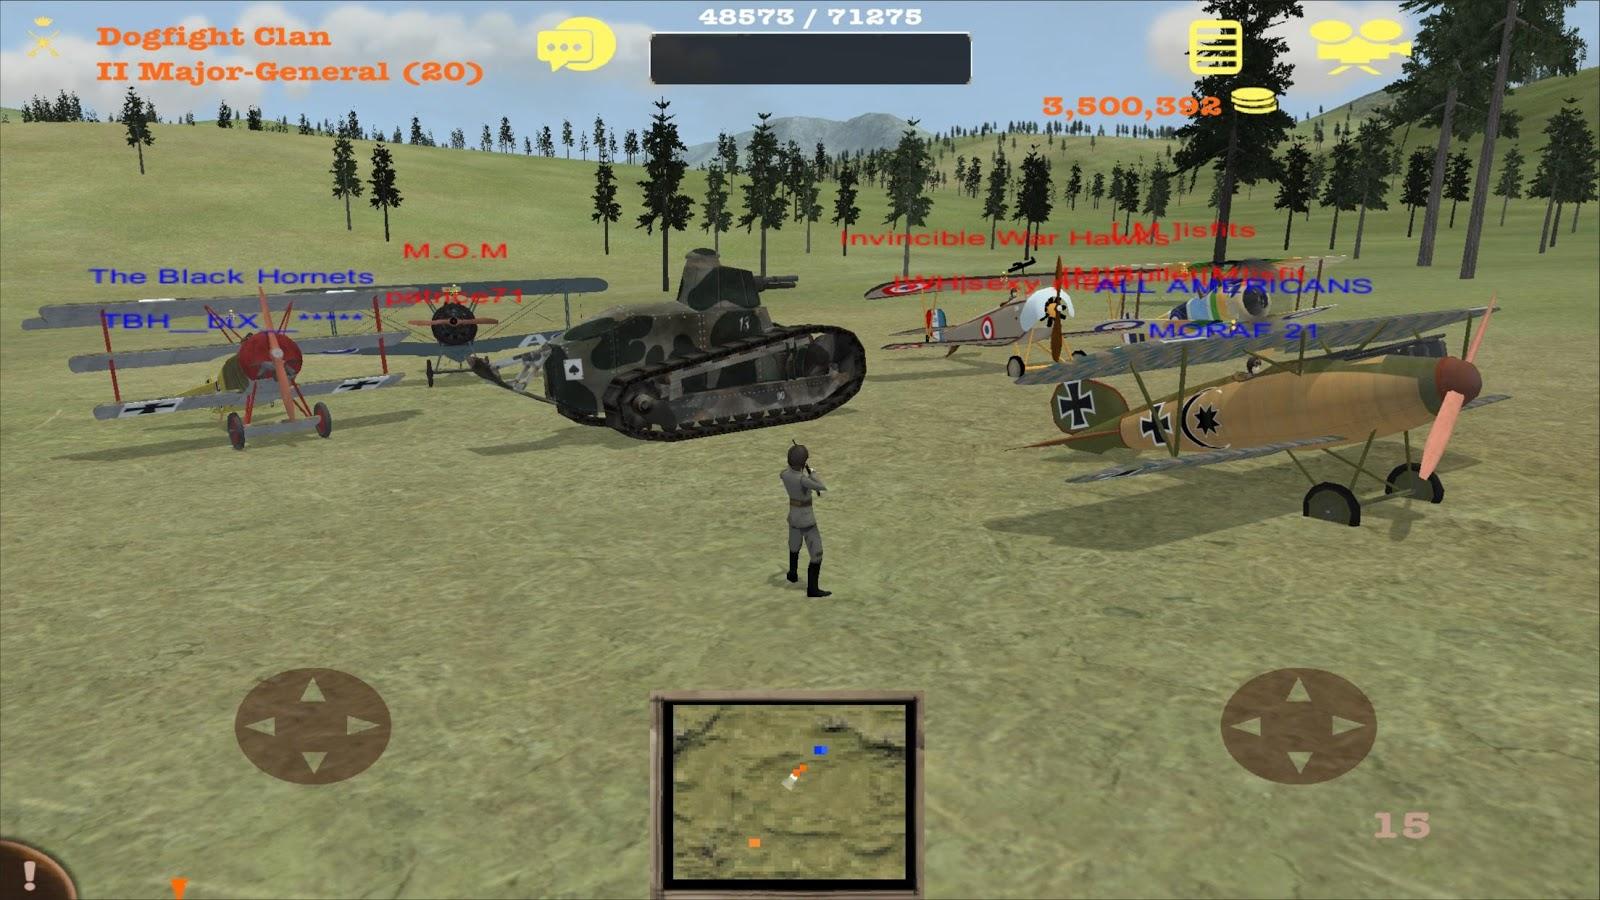 Dogfight- screenshot